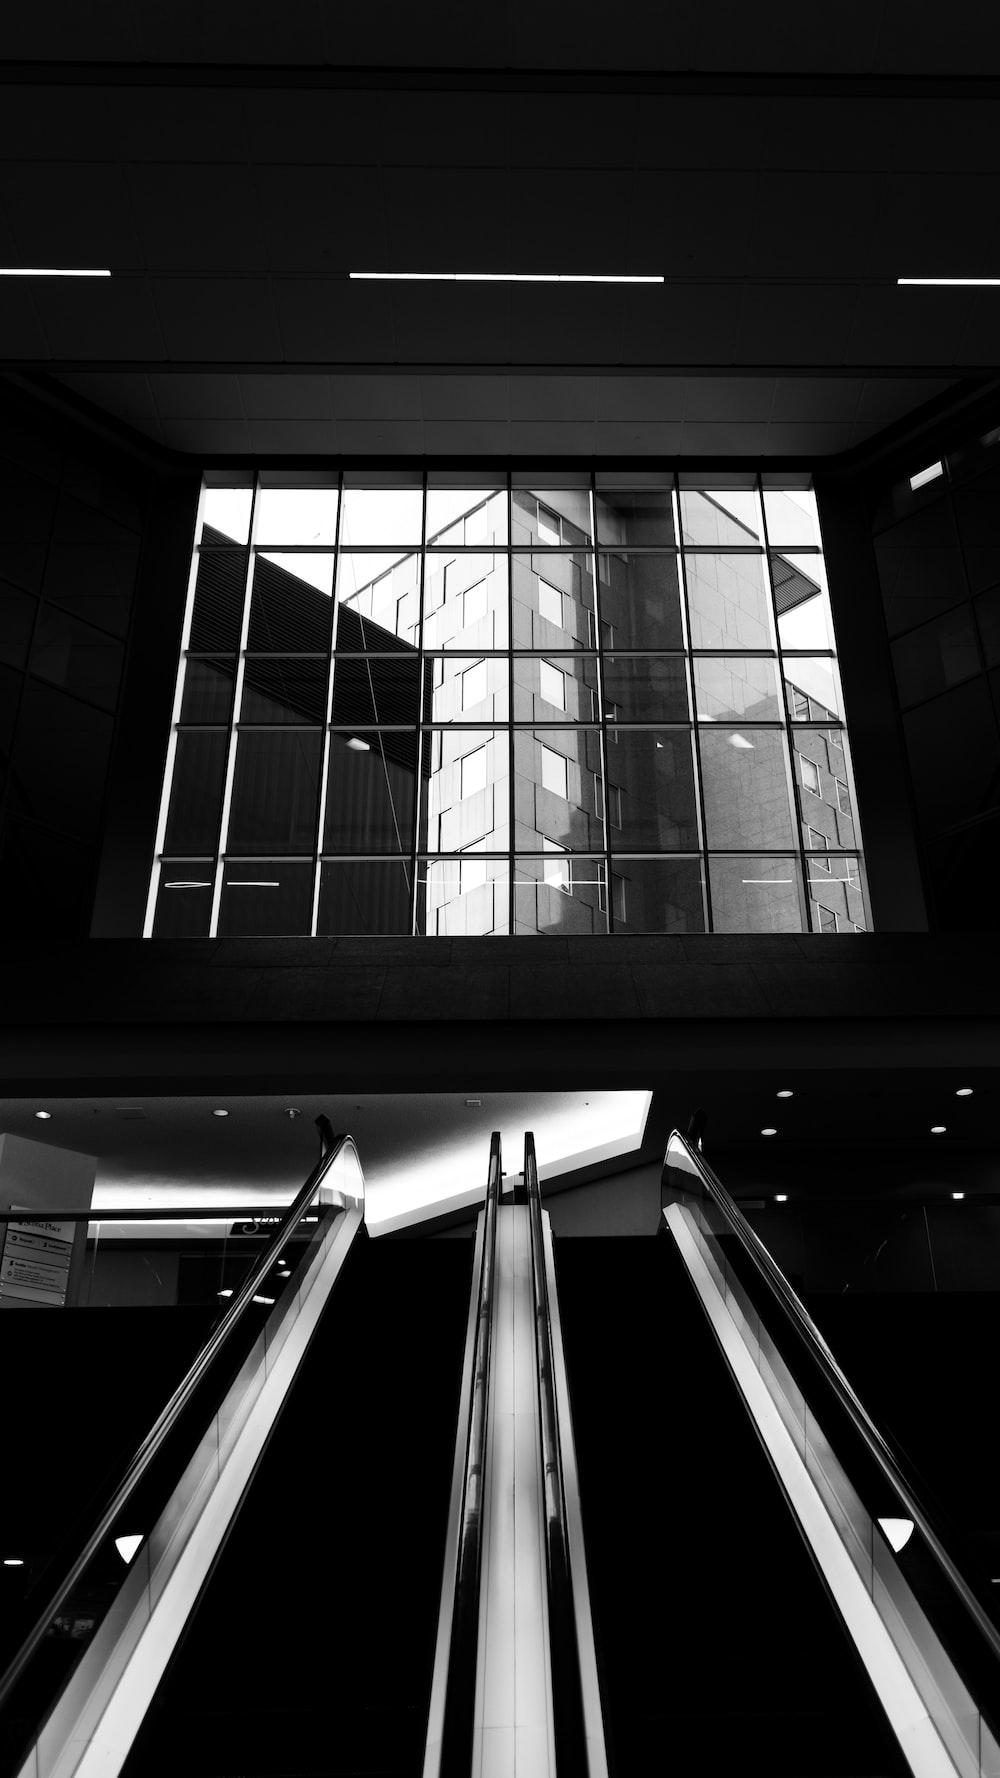 grayscale photo of a glass window